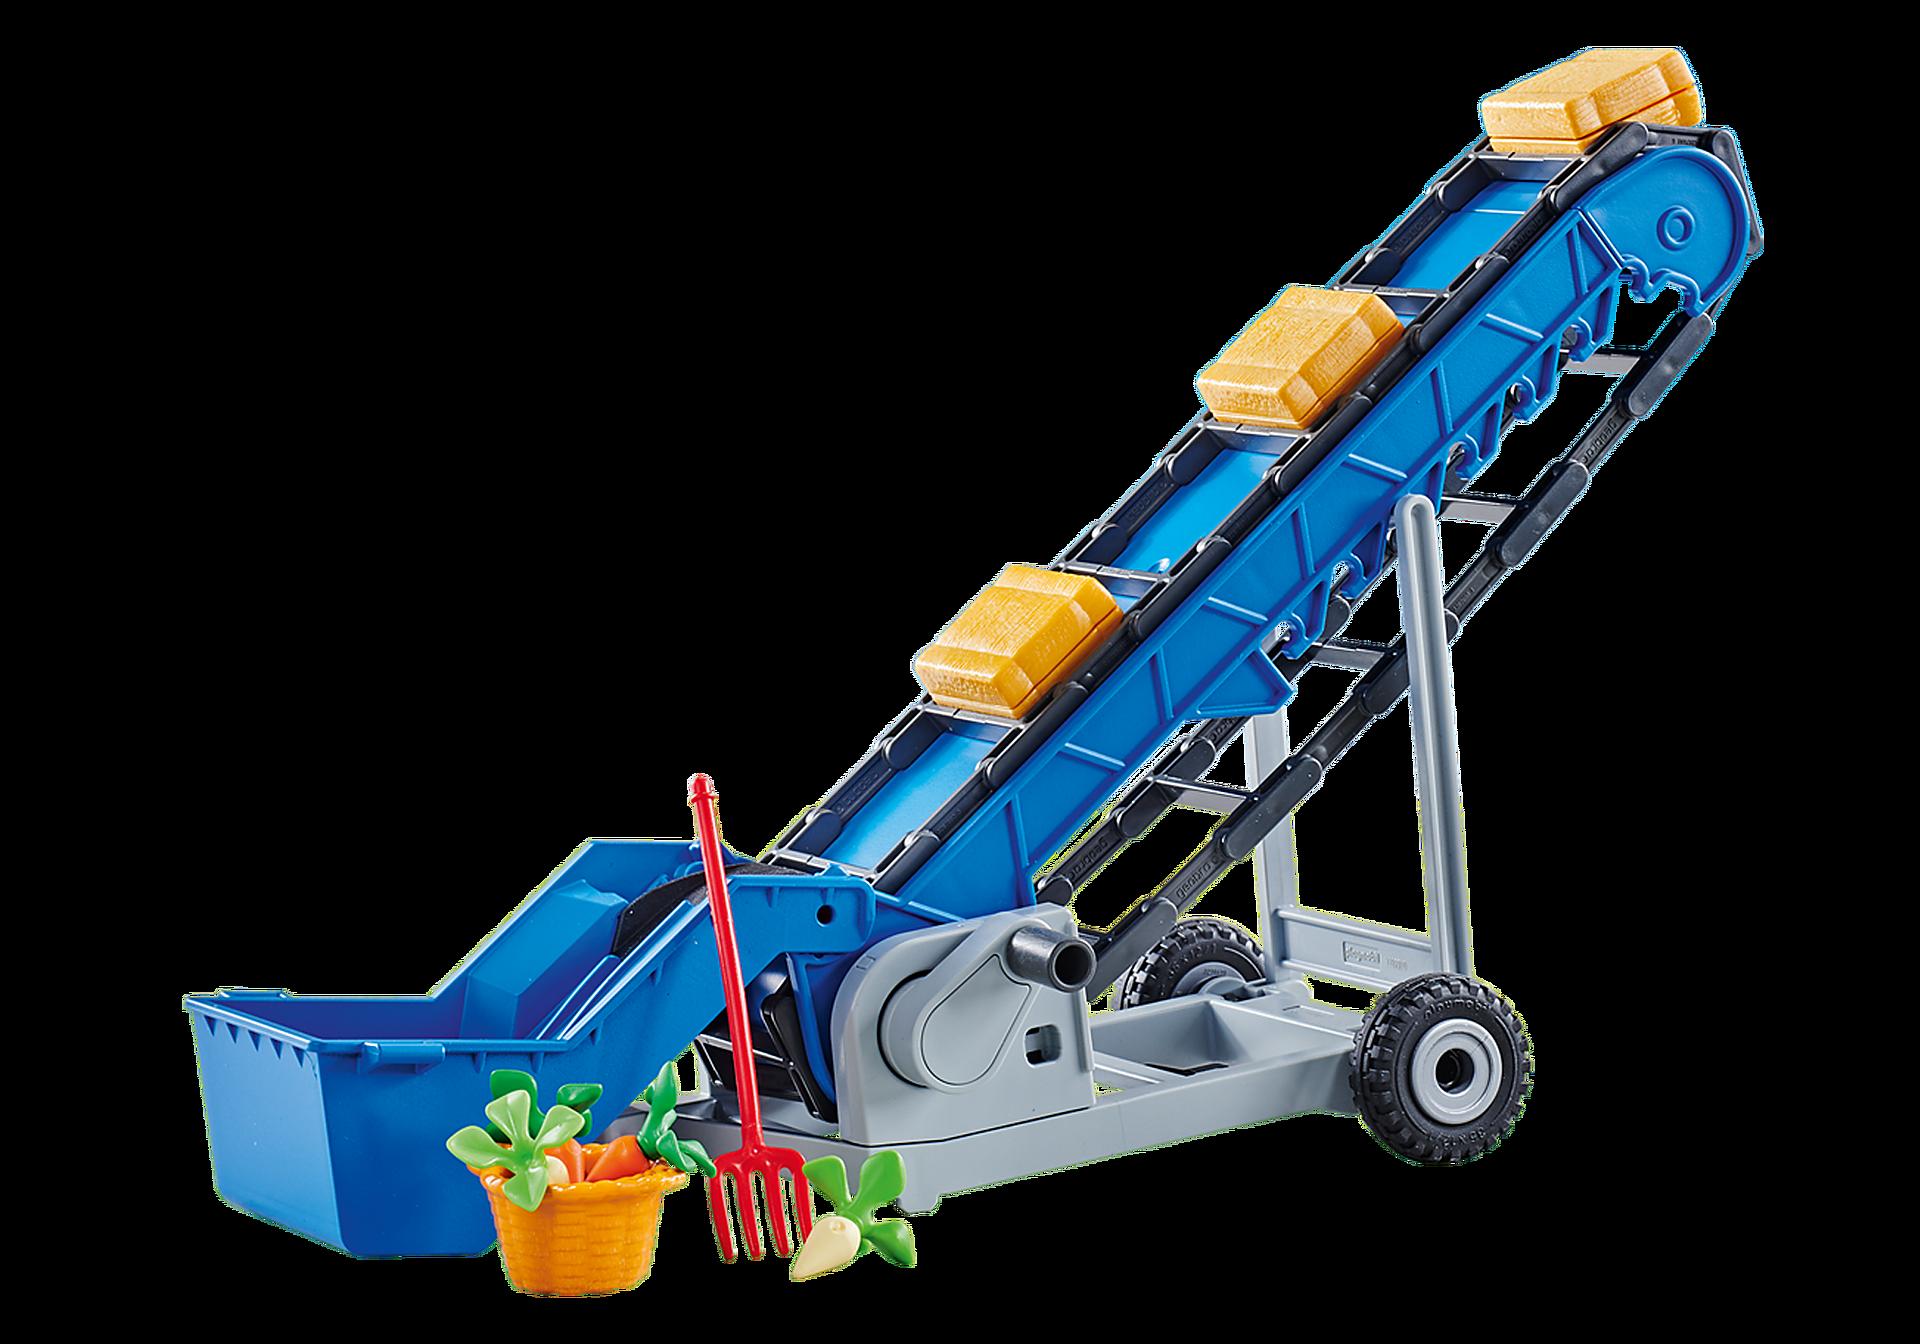 http://media.playmobil.com/i/playmobil/6576_product_detail/Φορητός ιμάντας μεταφοράς